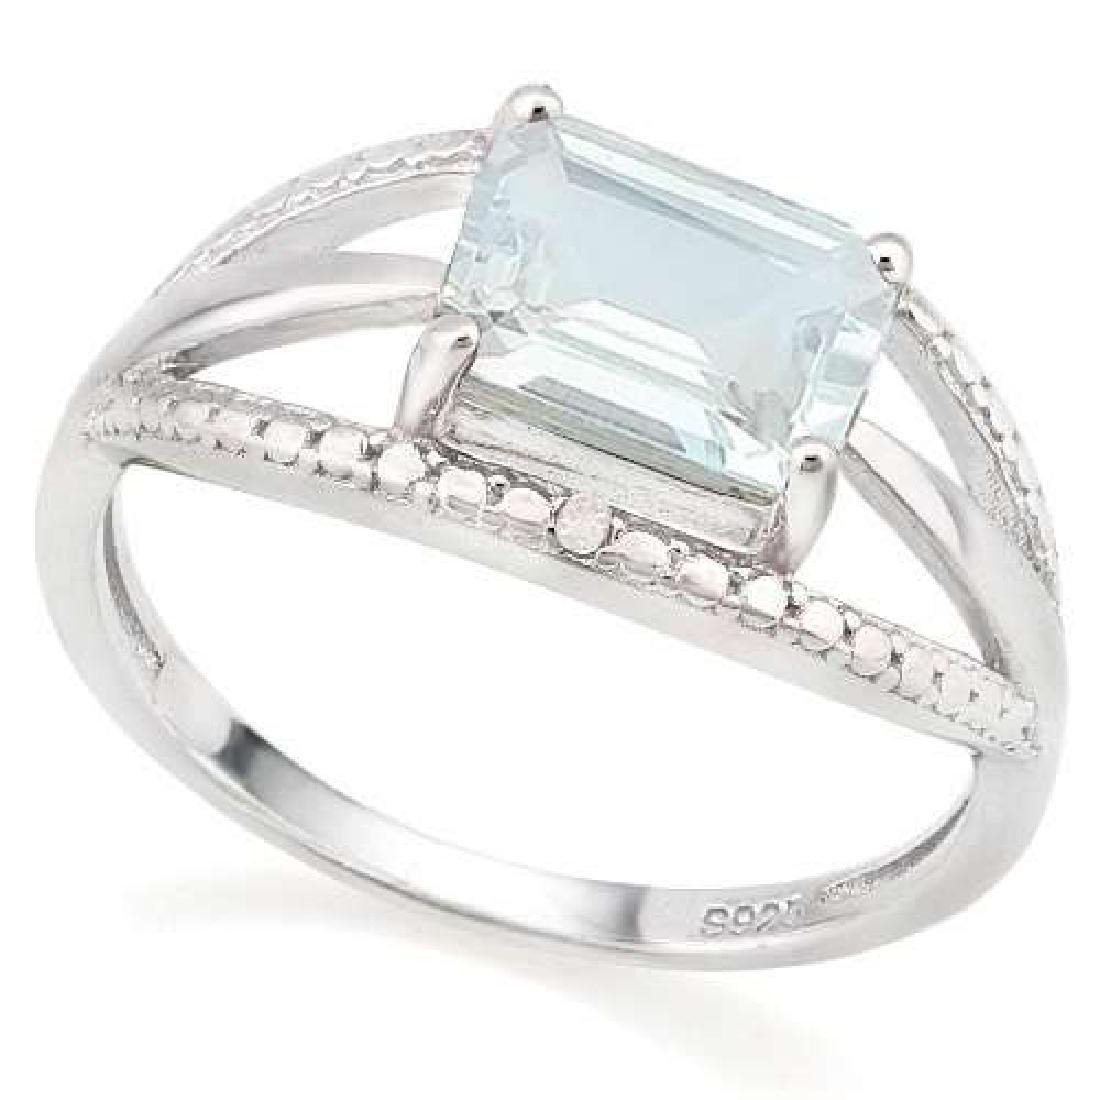 1 2/3 CTW AQUAMARINE & GENUINE DIAMONDS 925 STERLING SI